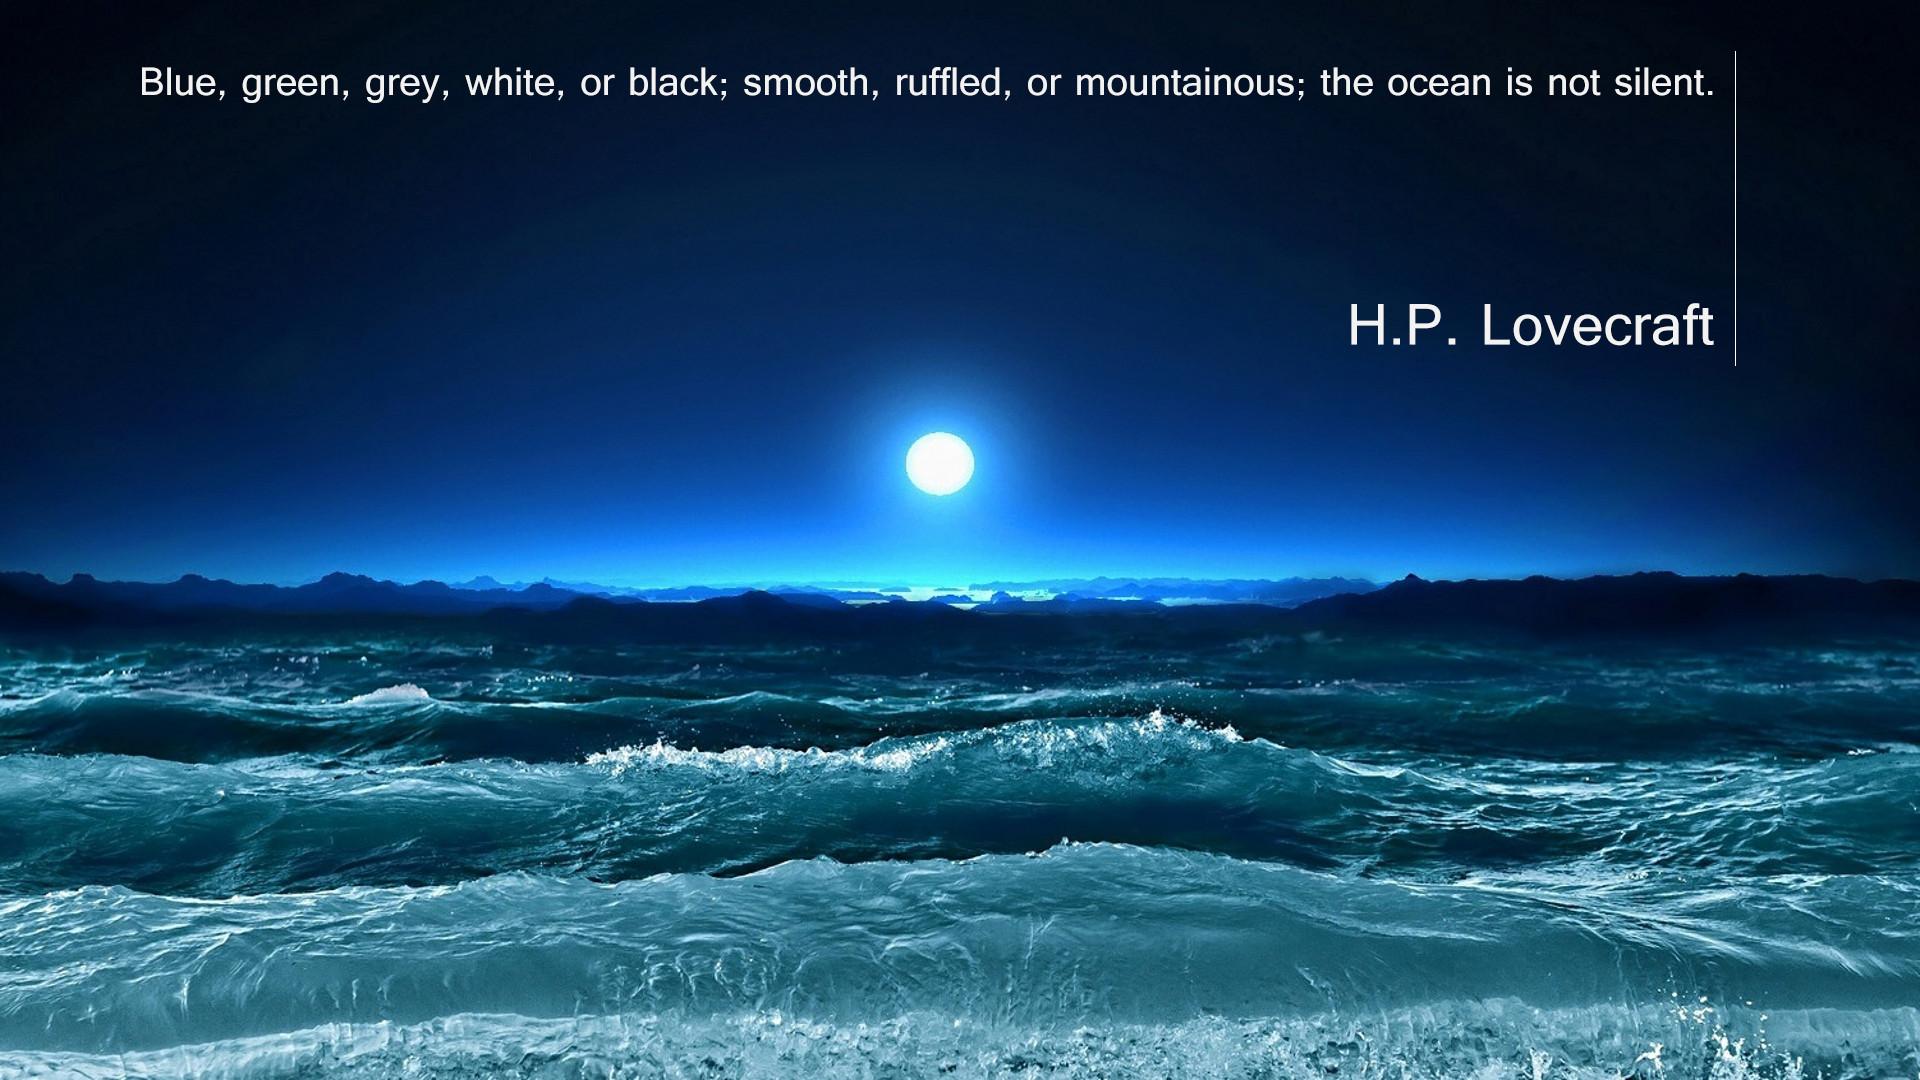 Sailing Quotes Inspirational Quotesgram: Inspirational Quotes About The Ocean. QuotesGram